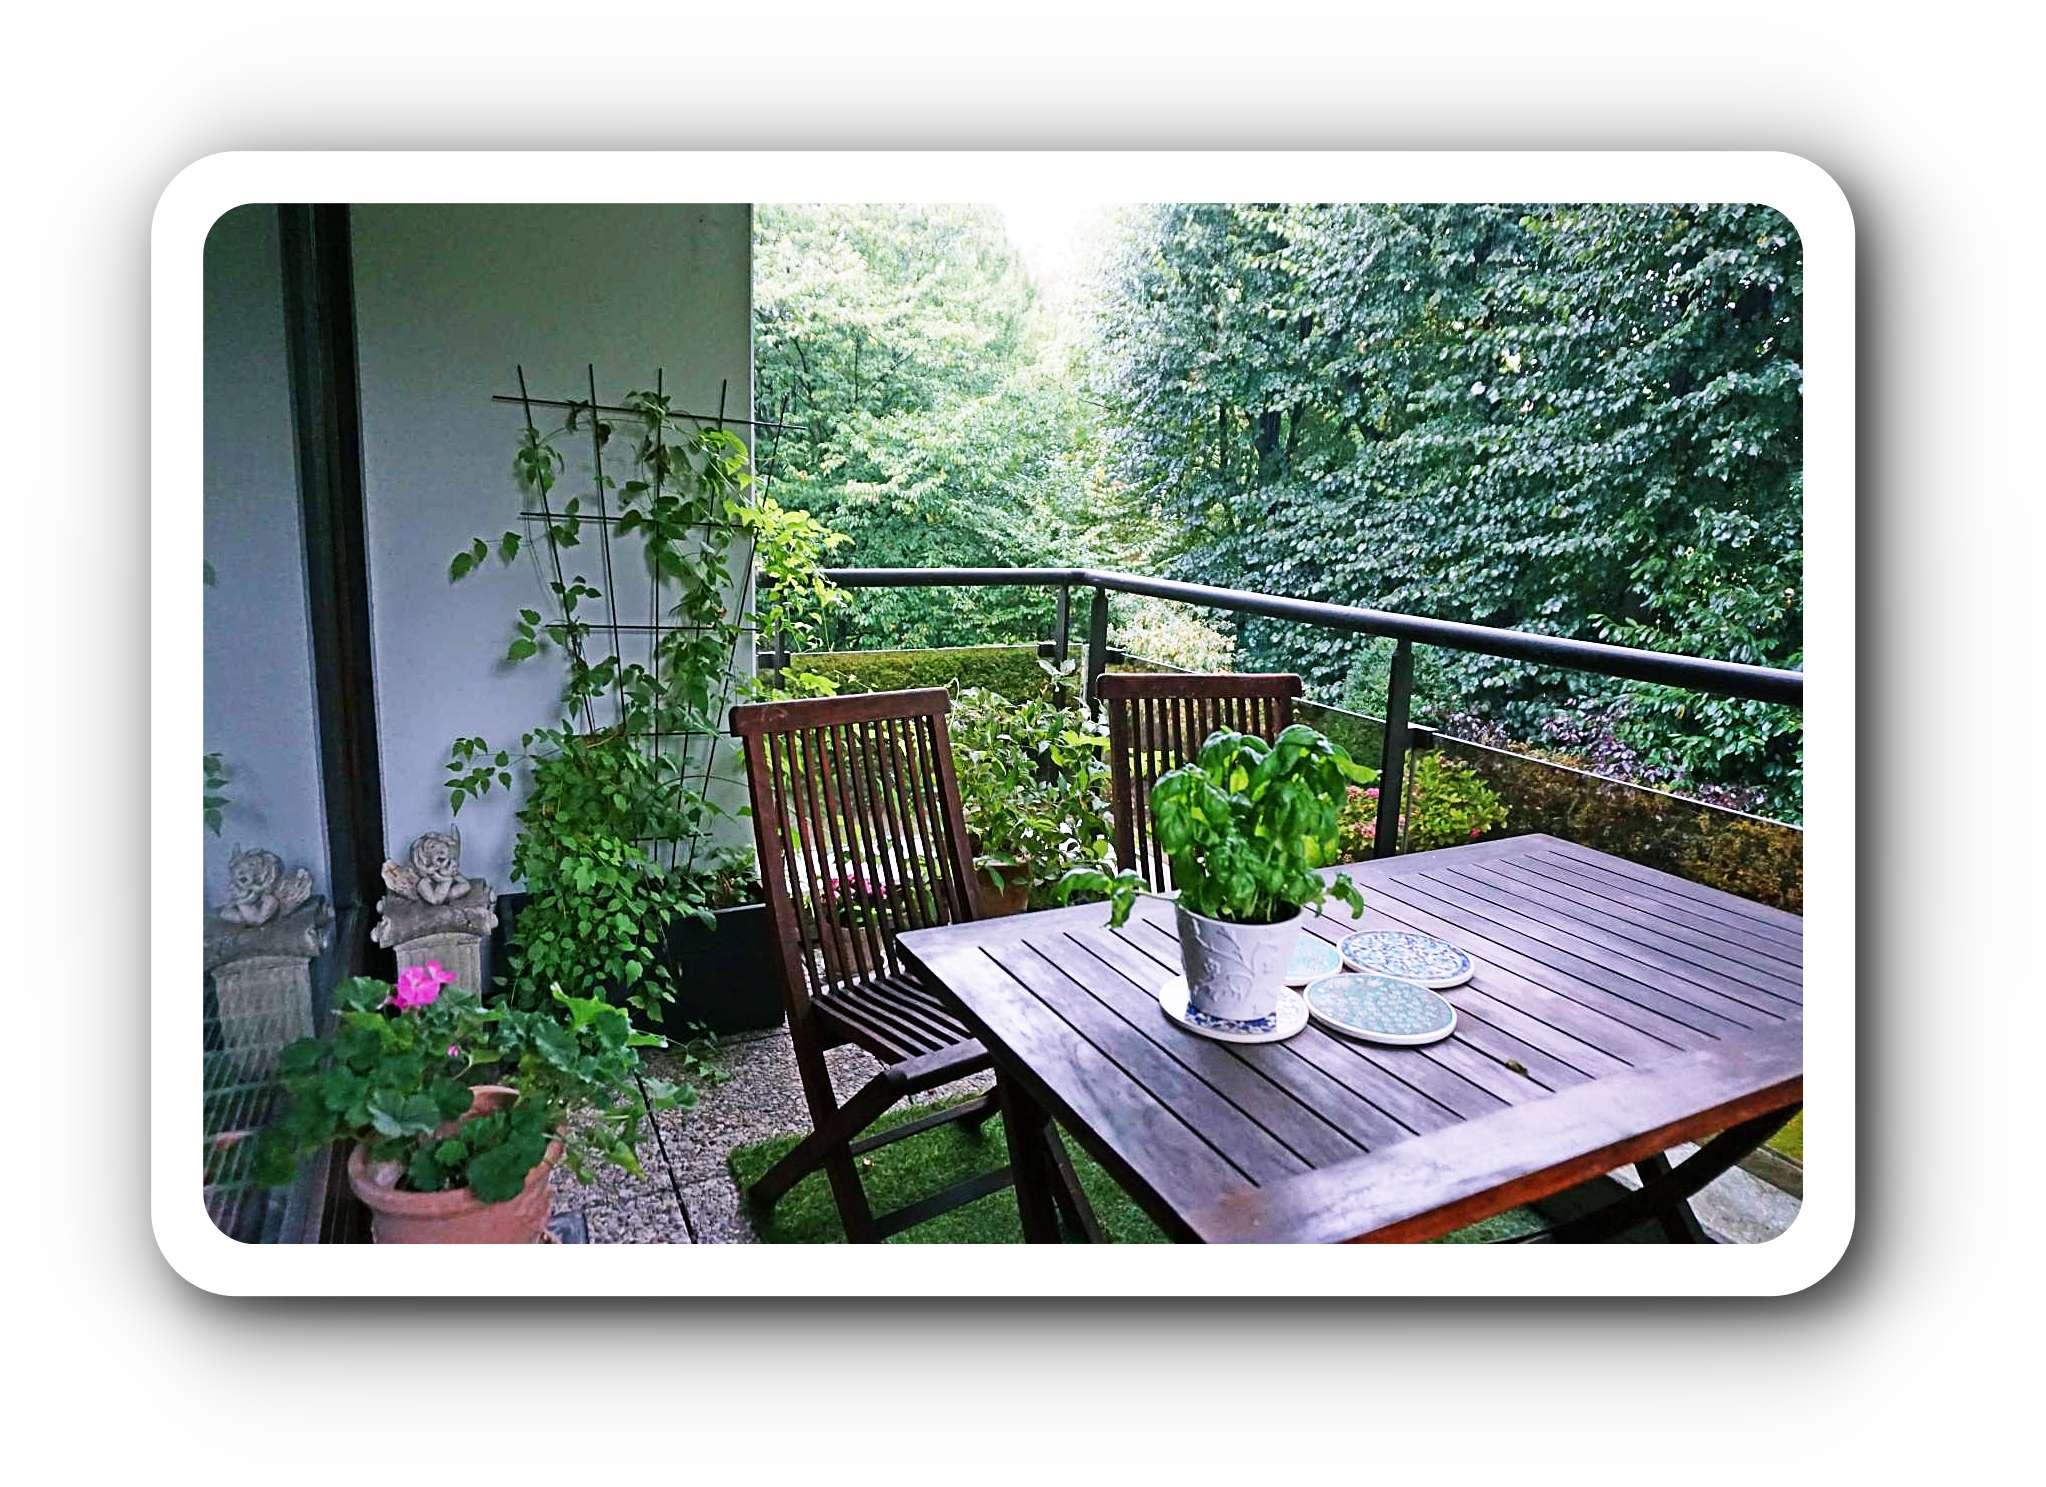 hamburg eppendorf wohnung. Black Bedroom Furniture Sets. Home Design Ideas